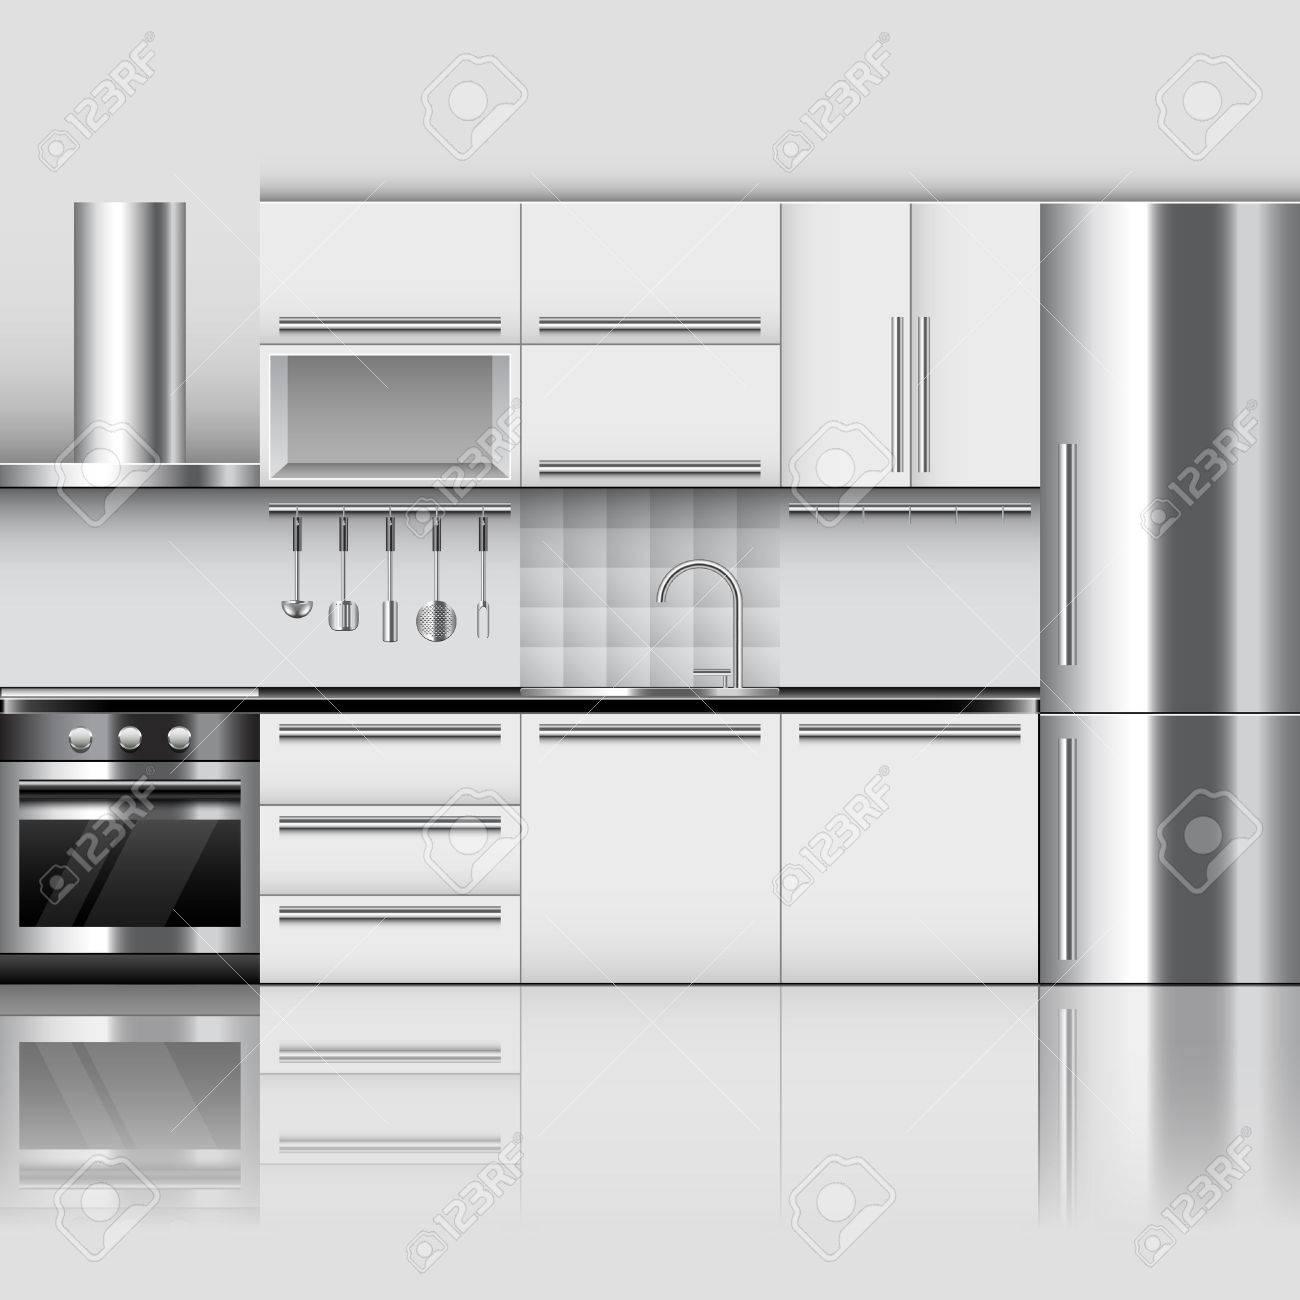 Modern Kitchen Interior Photo Realistic Vector Background Royalty